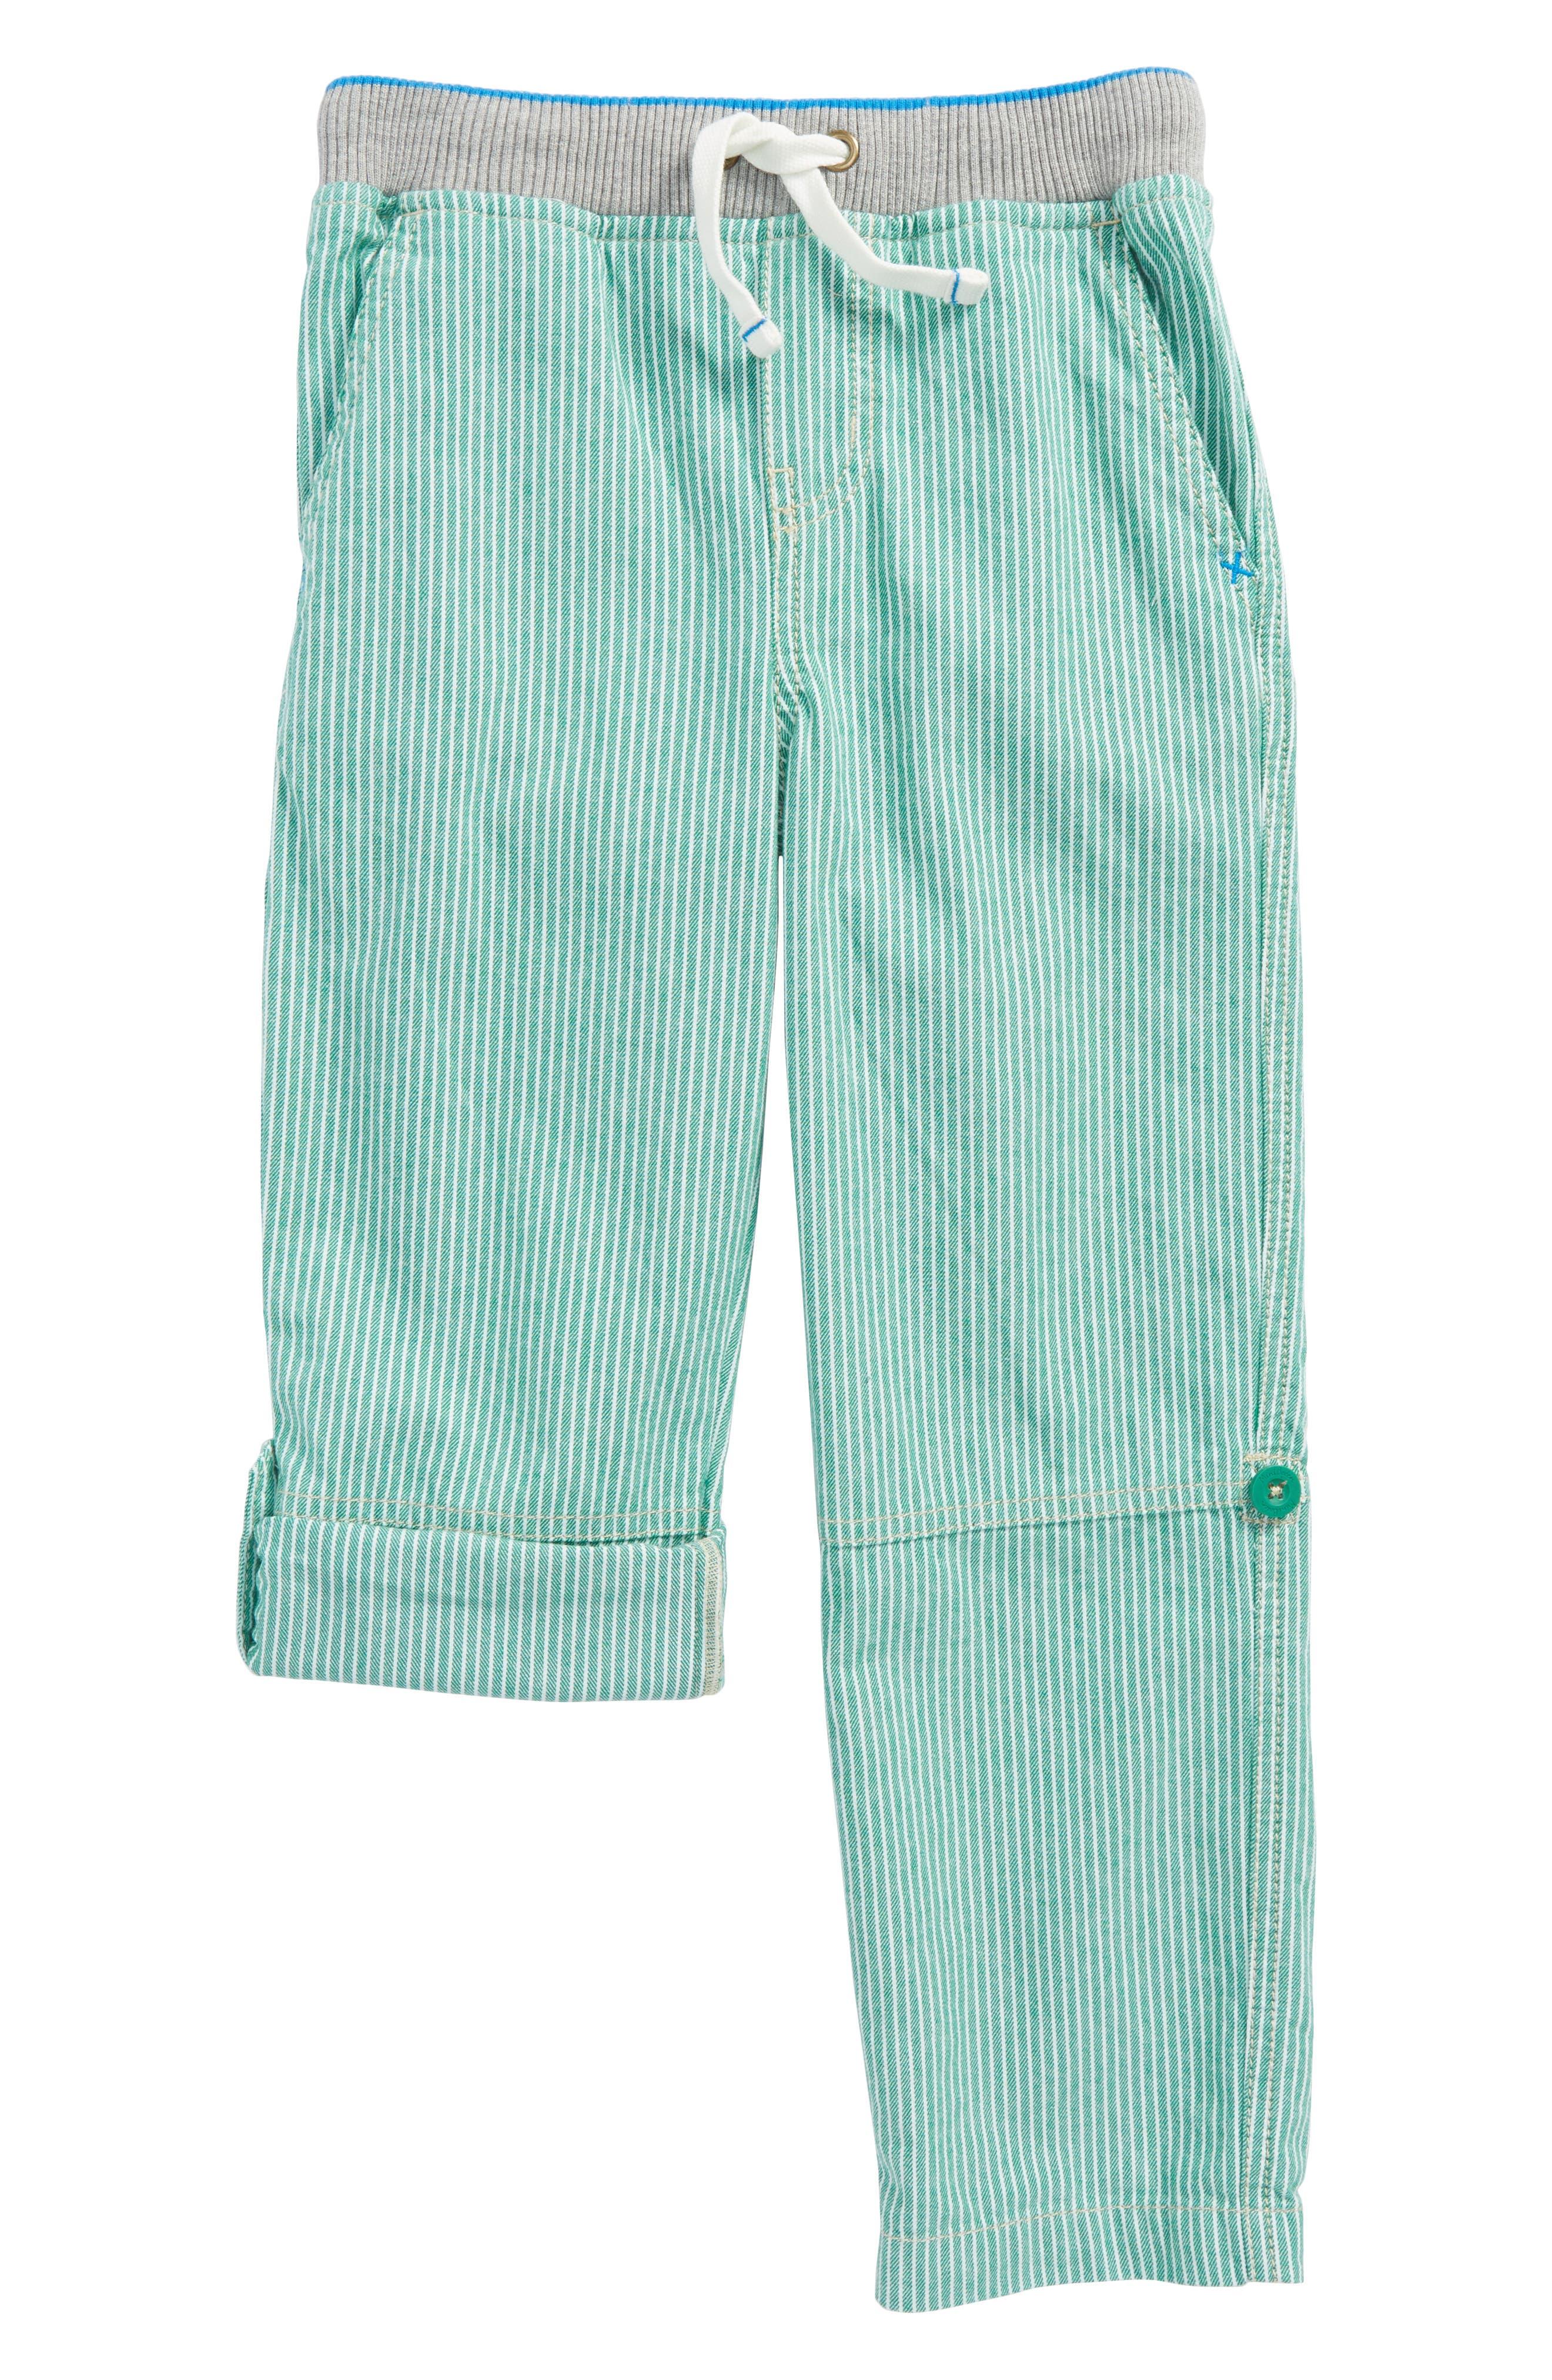 Surf Roll-Up Pants,                             Main thumbnail 1, color,                             Moringa Green/ Ecru